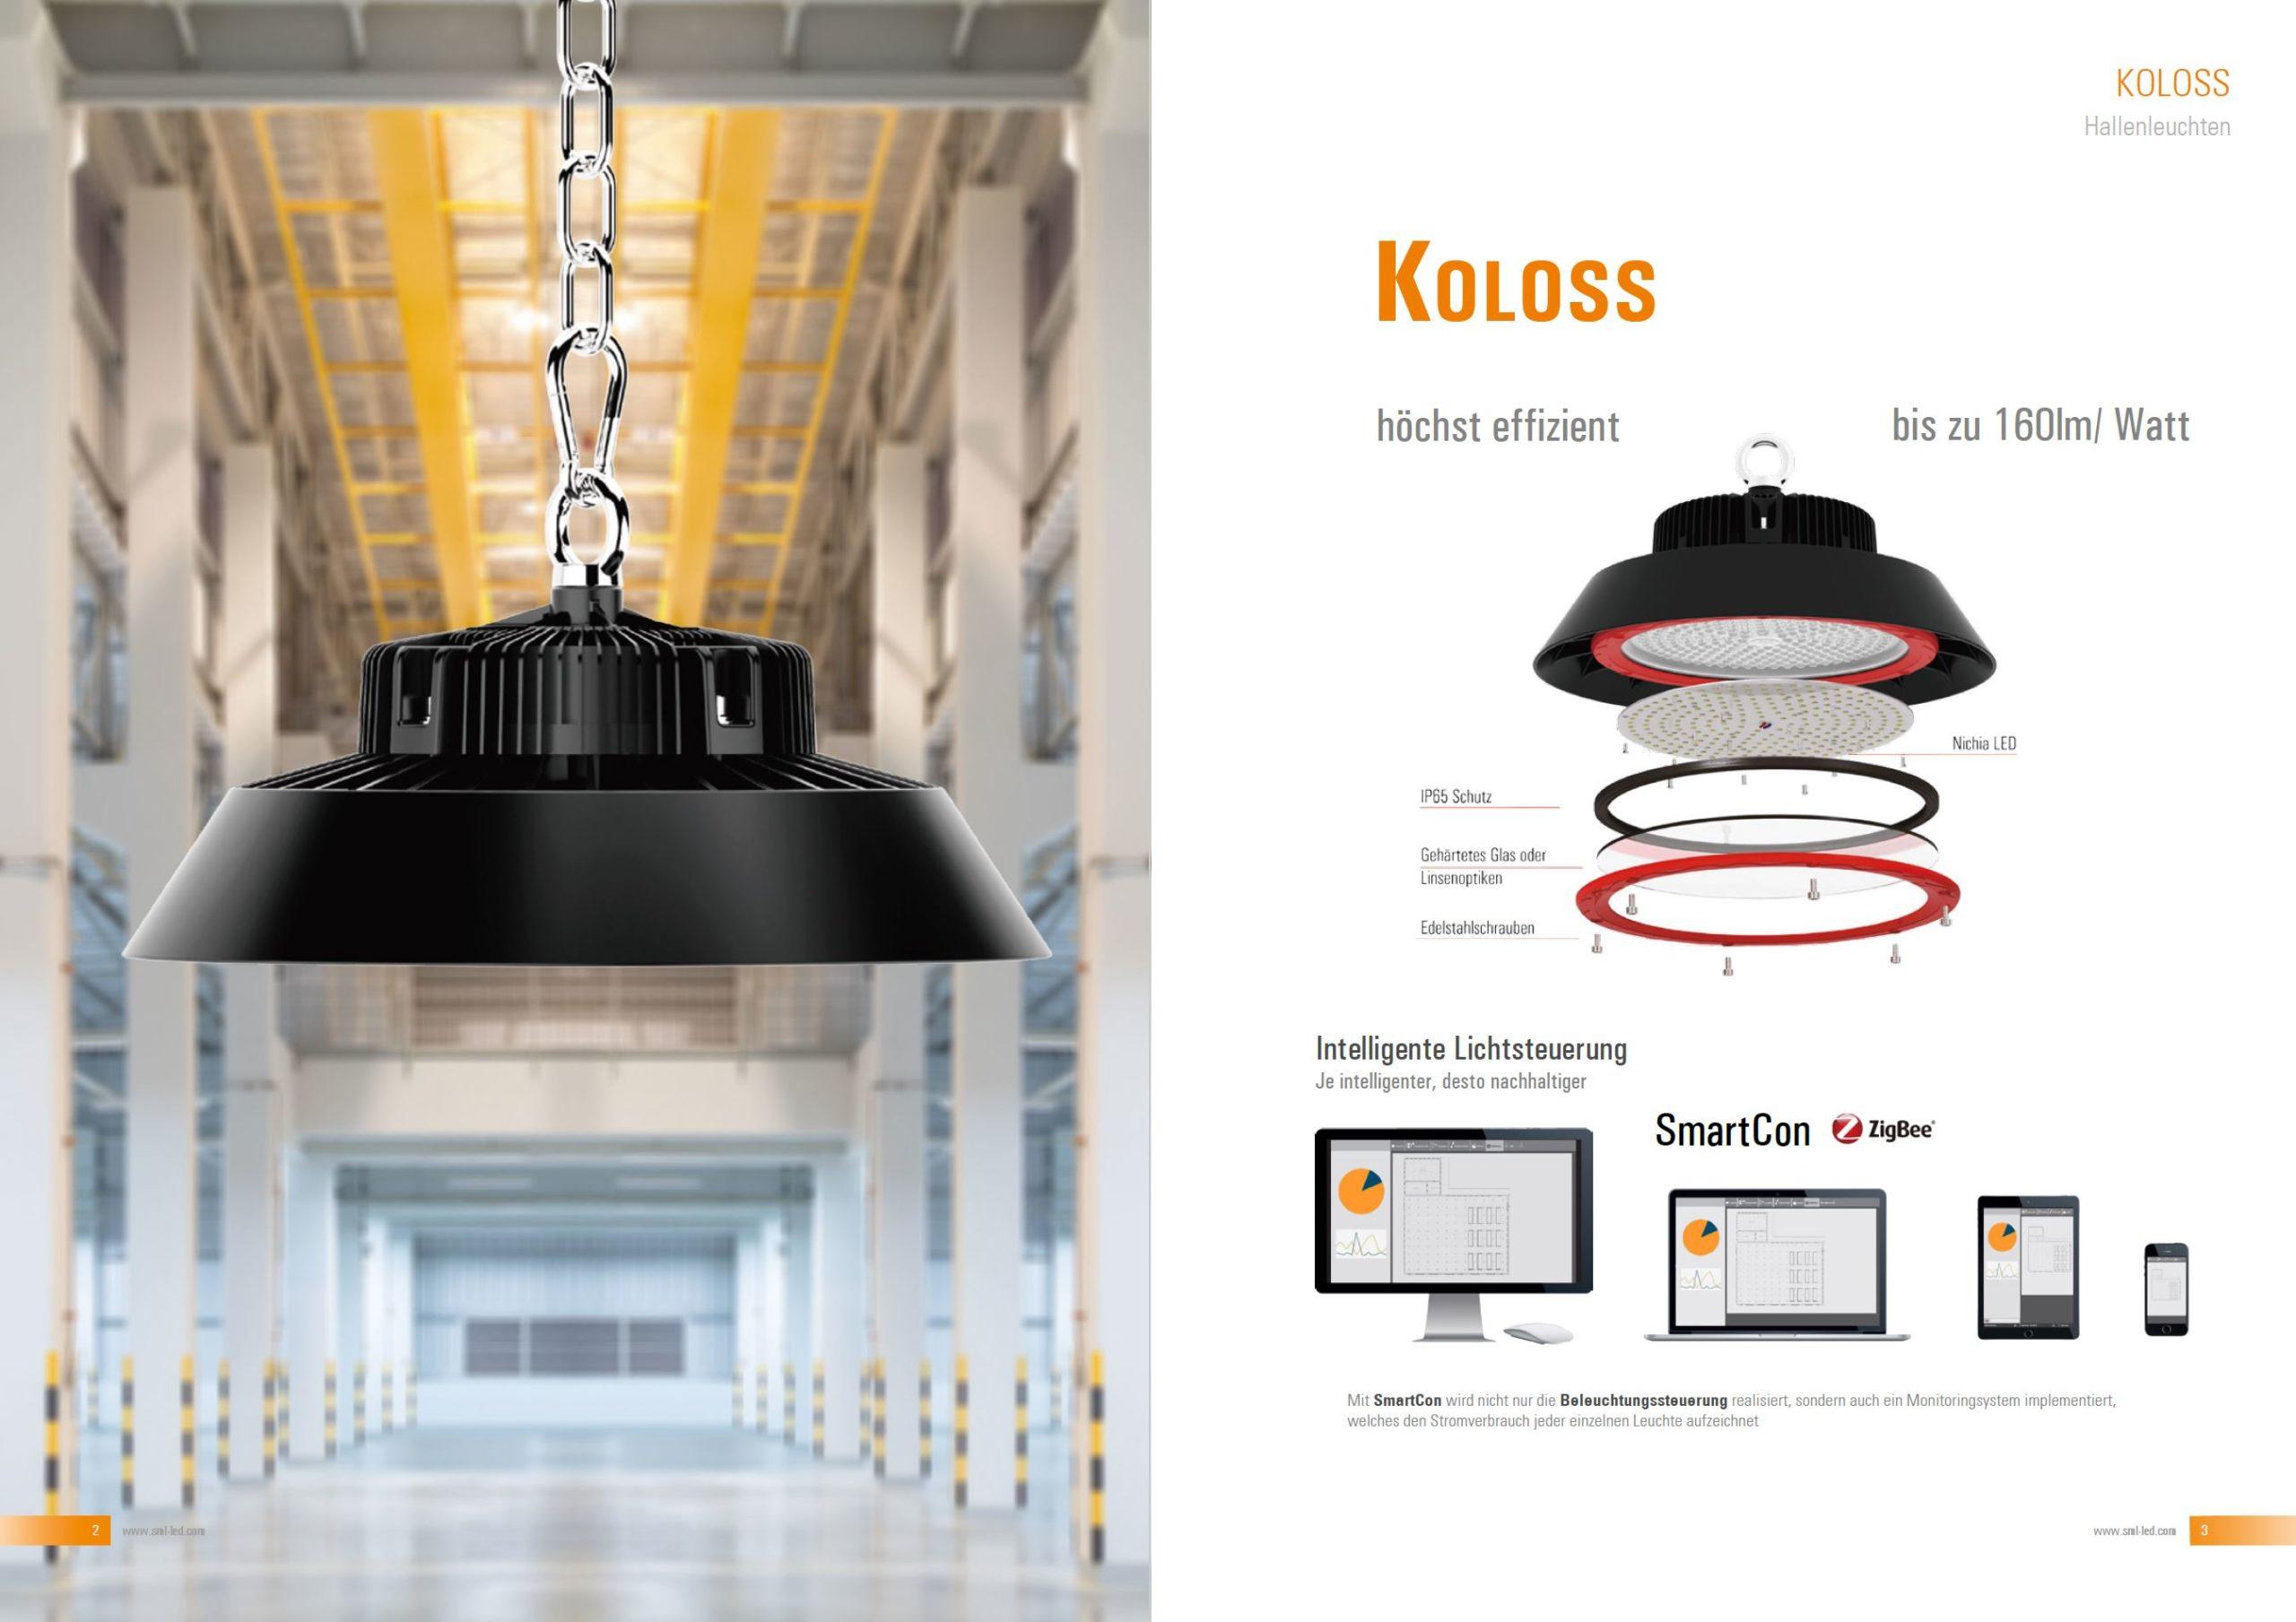 LED Hallenleuchte Koloss für LED Hallenbeleuchtung